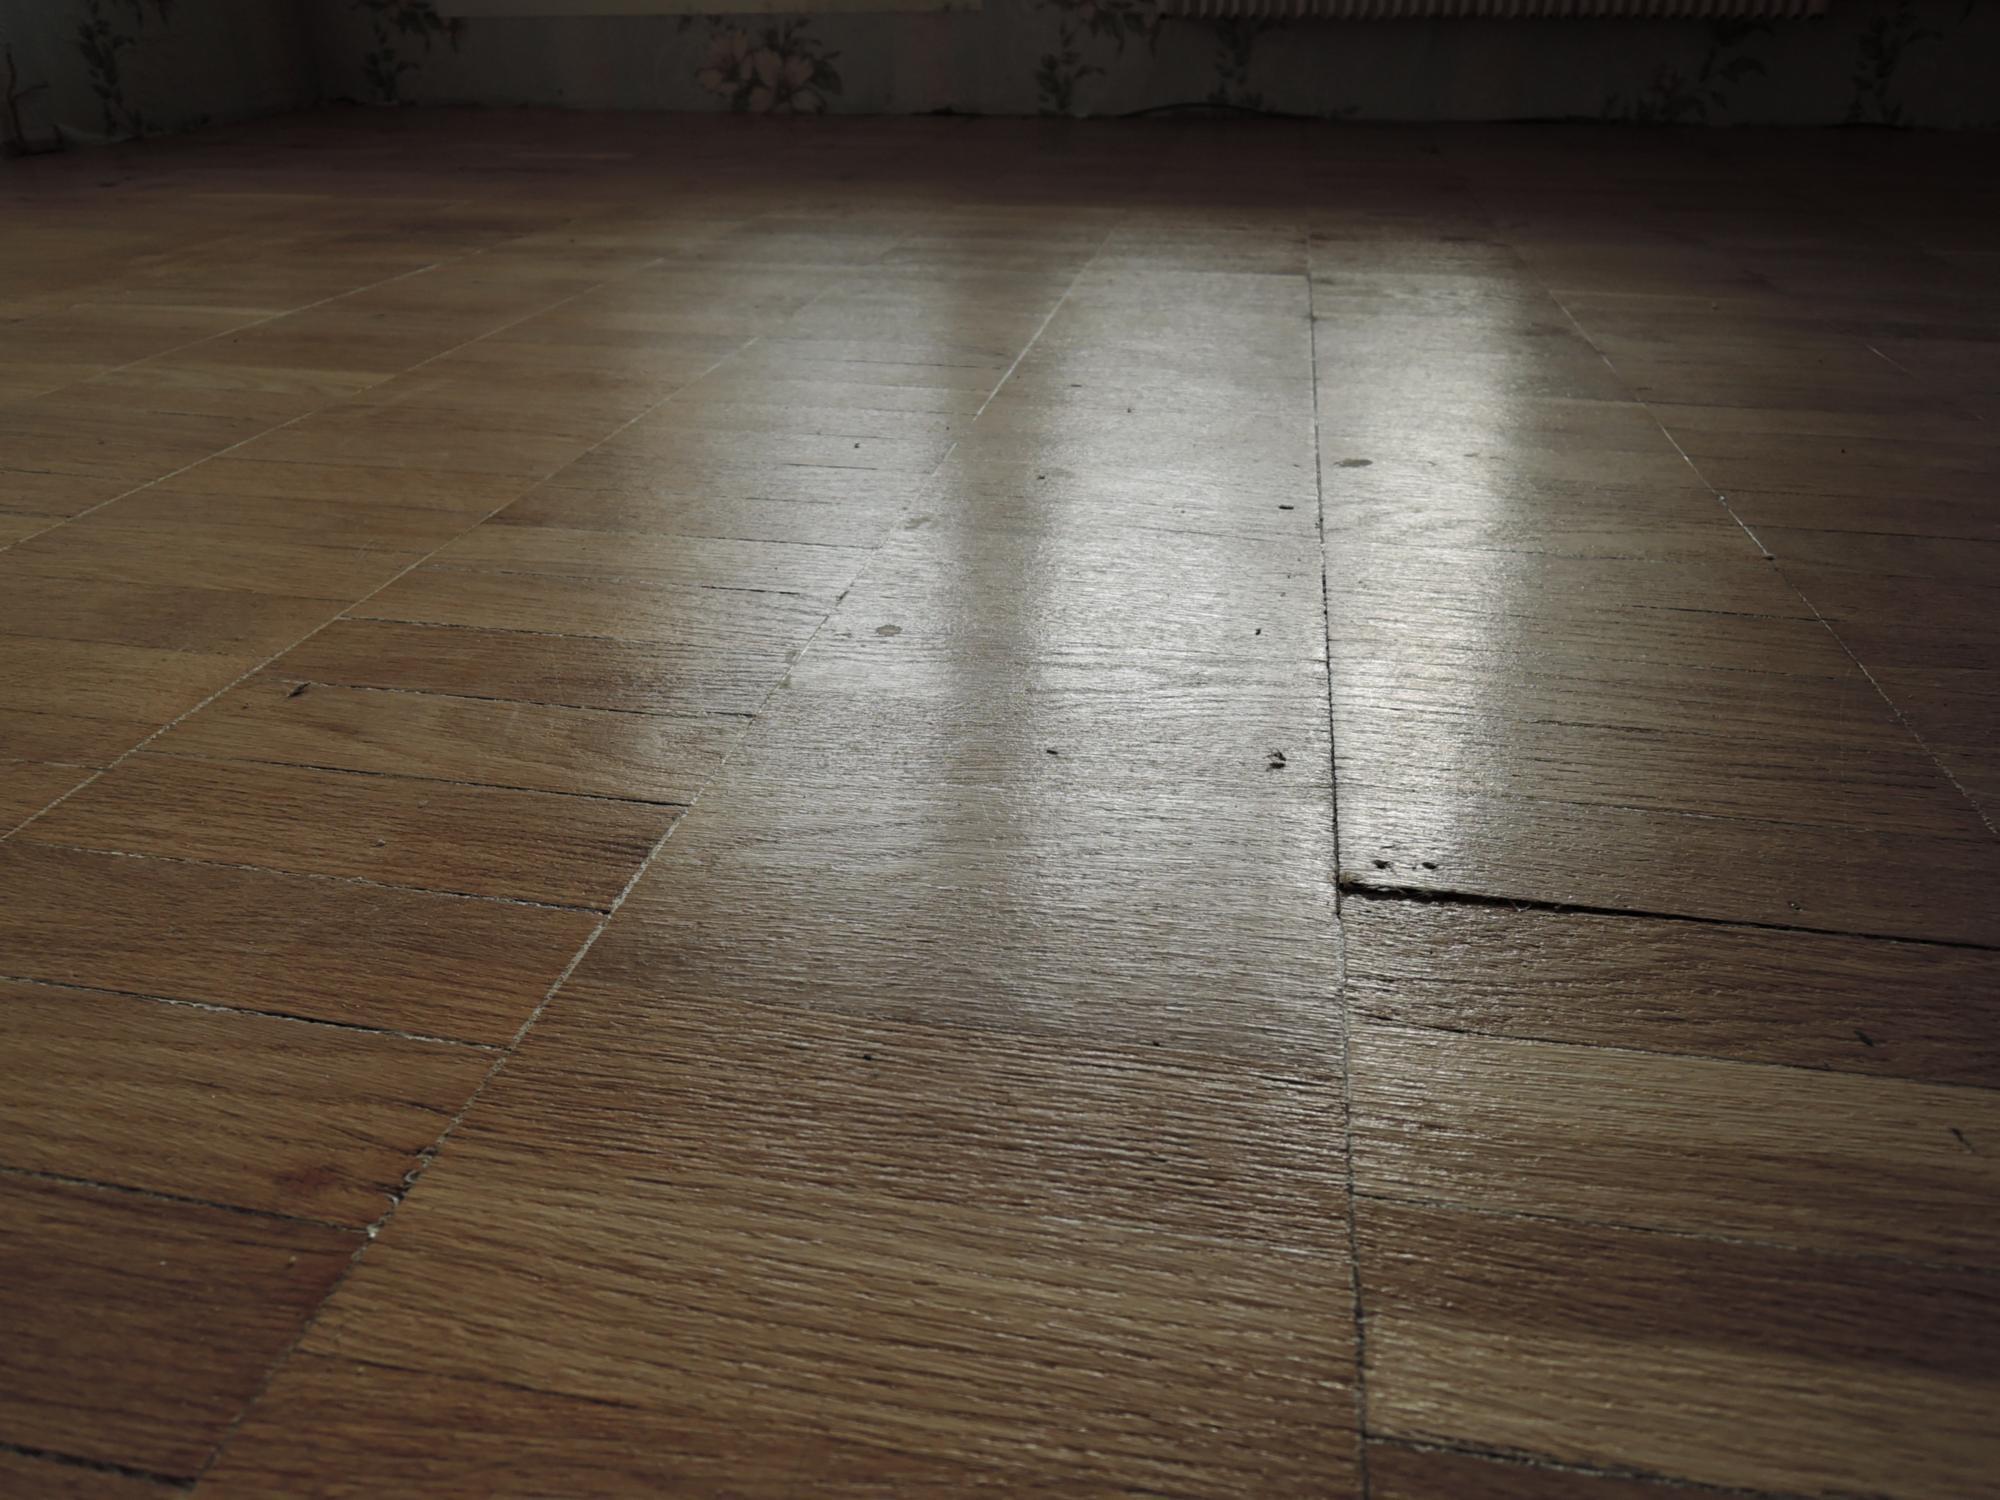 How to clean commercial vinyl tile floors